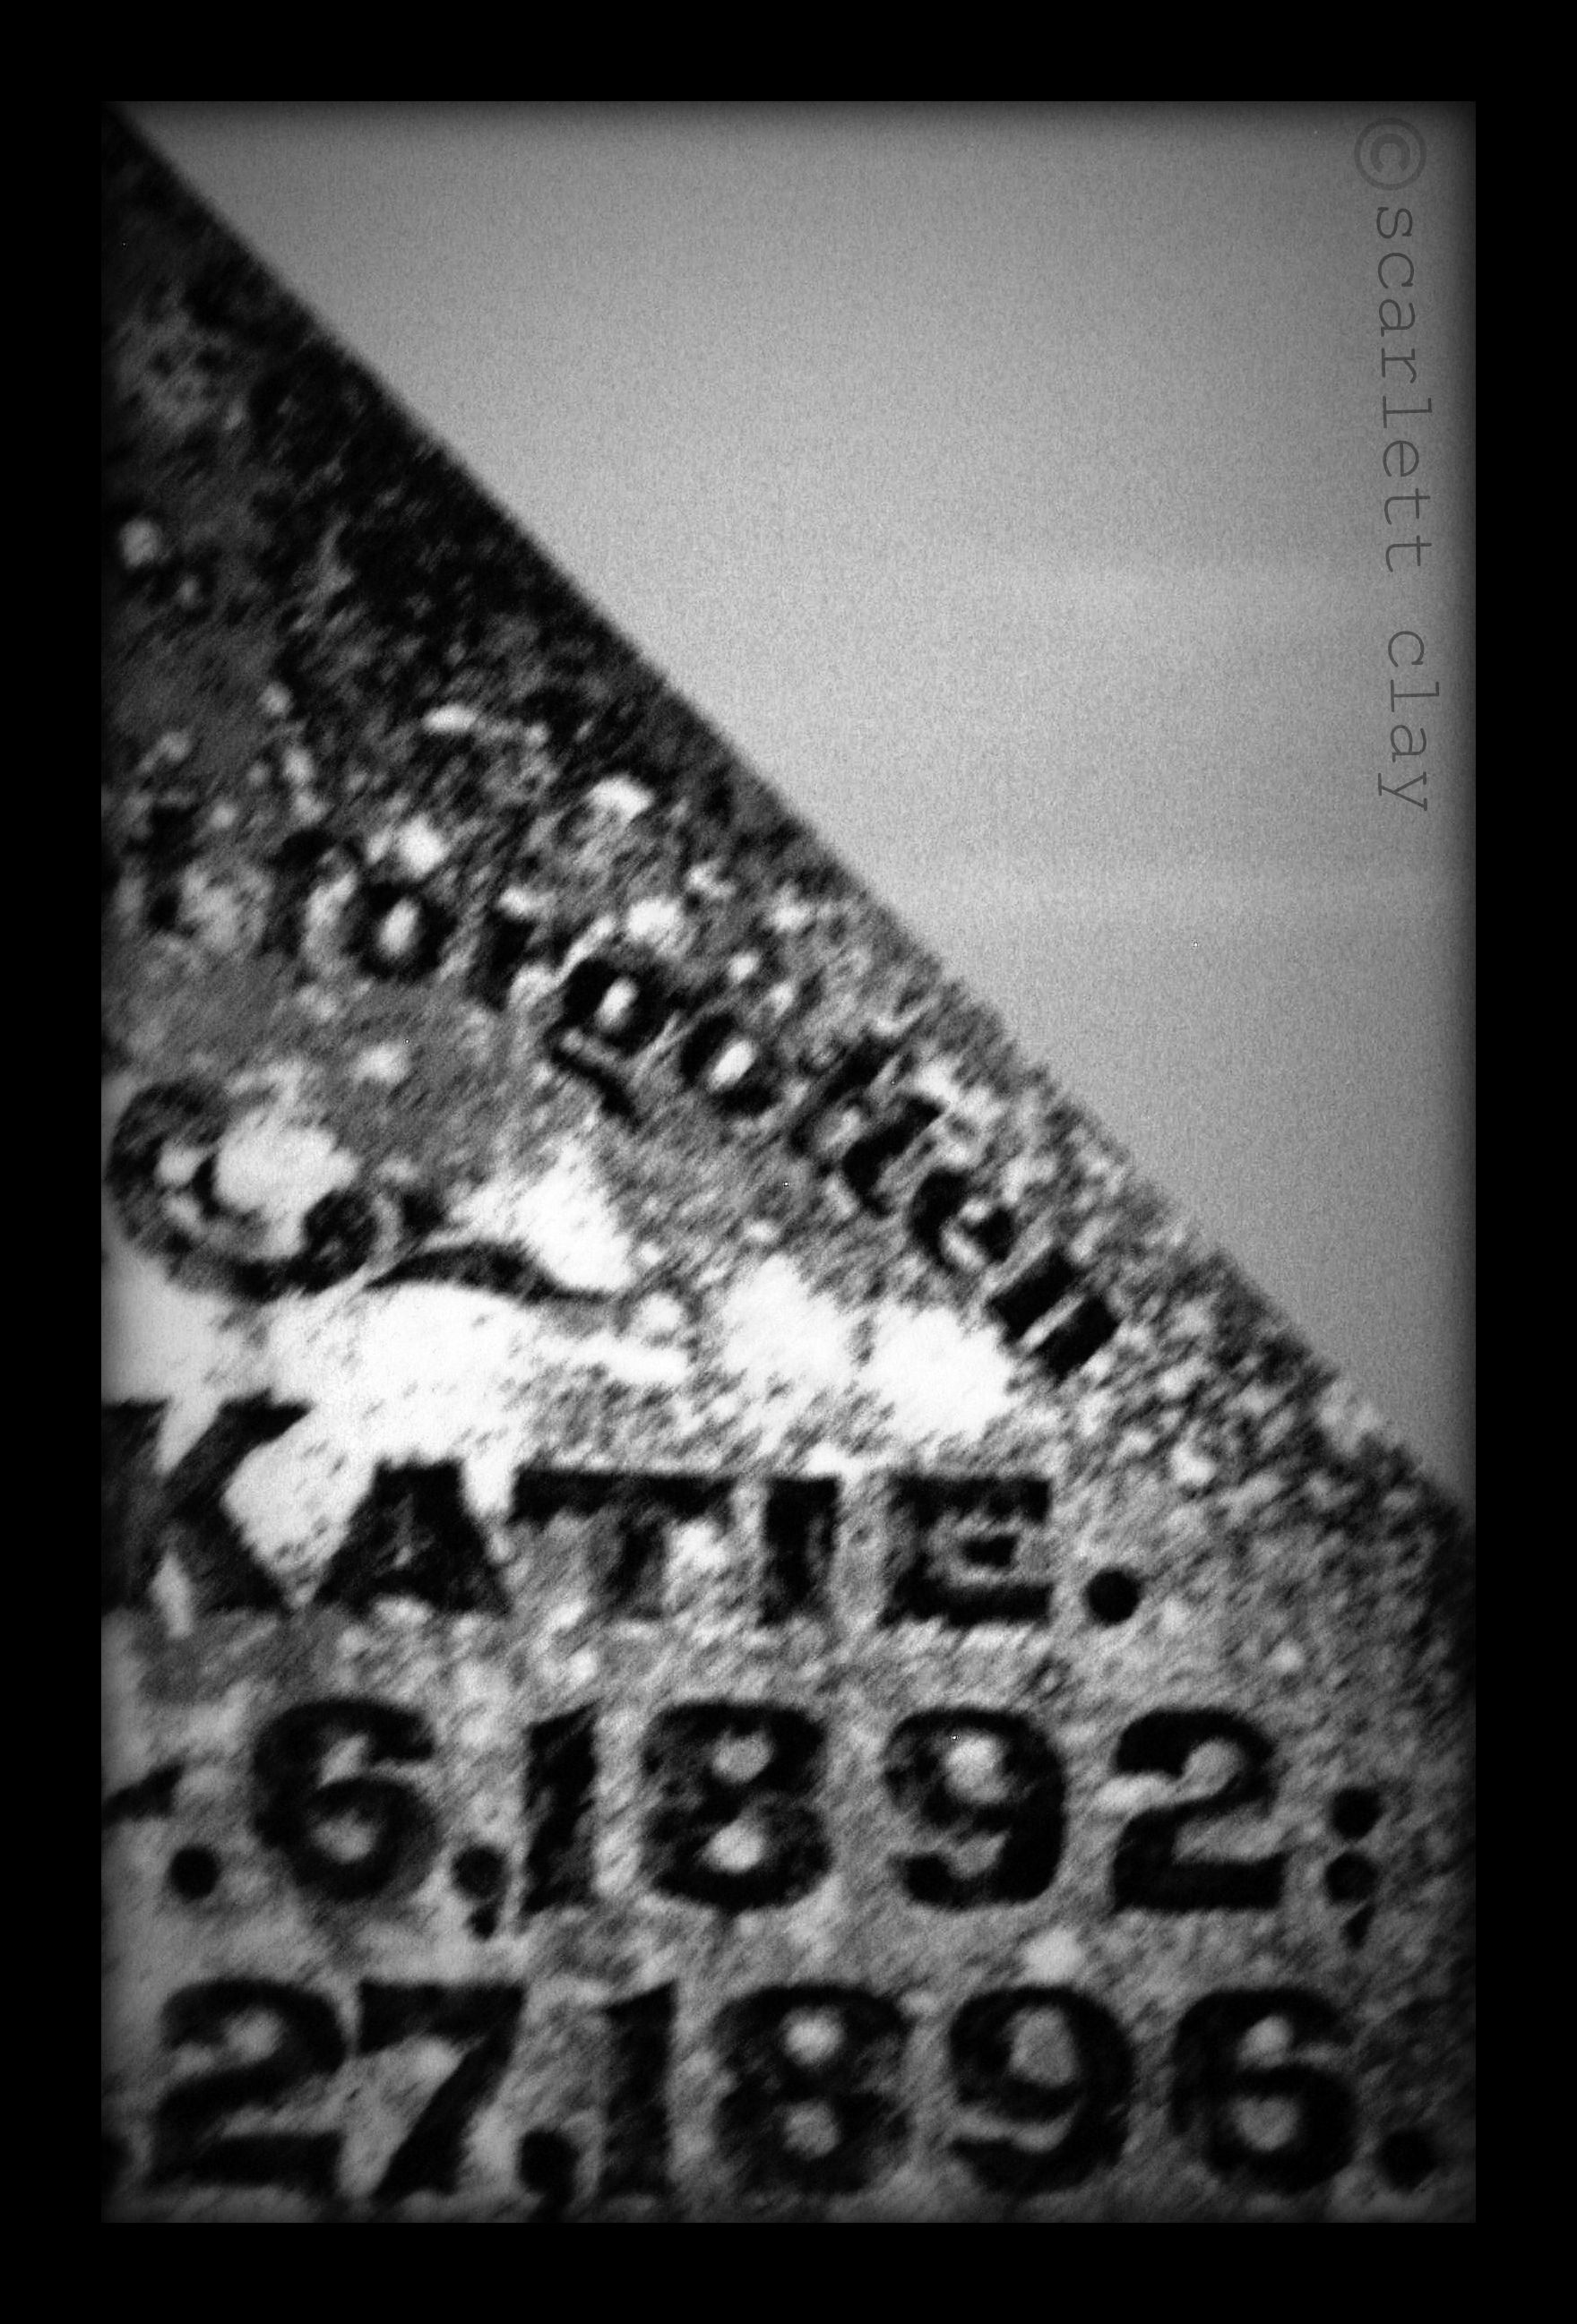 photo class-last project katie